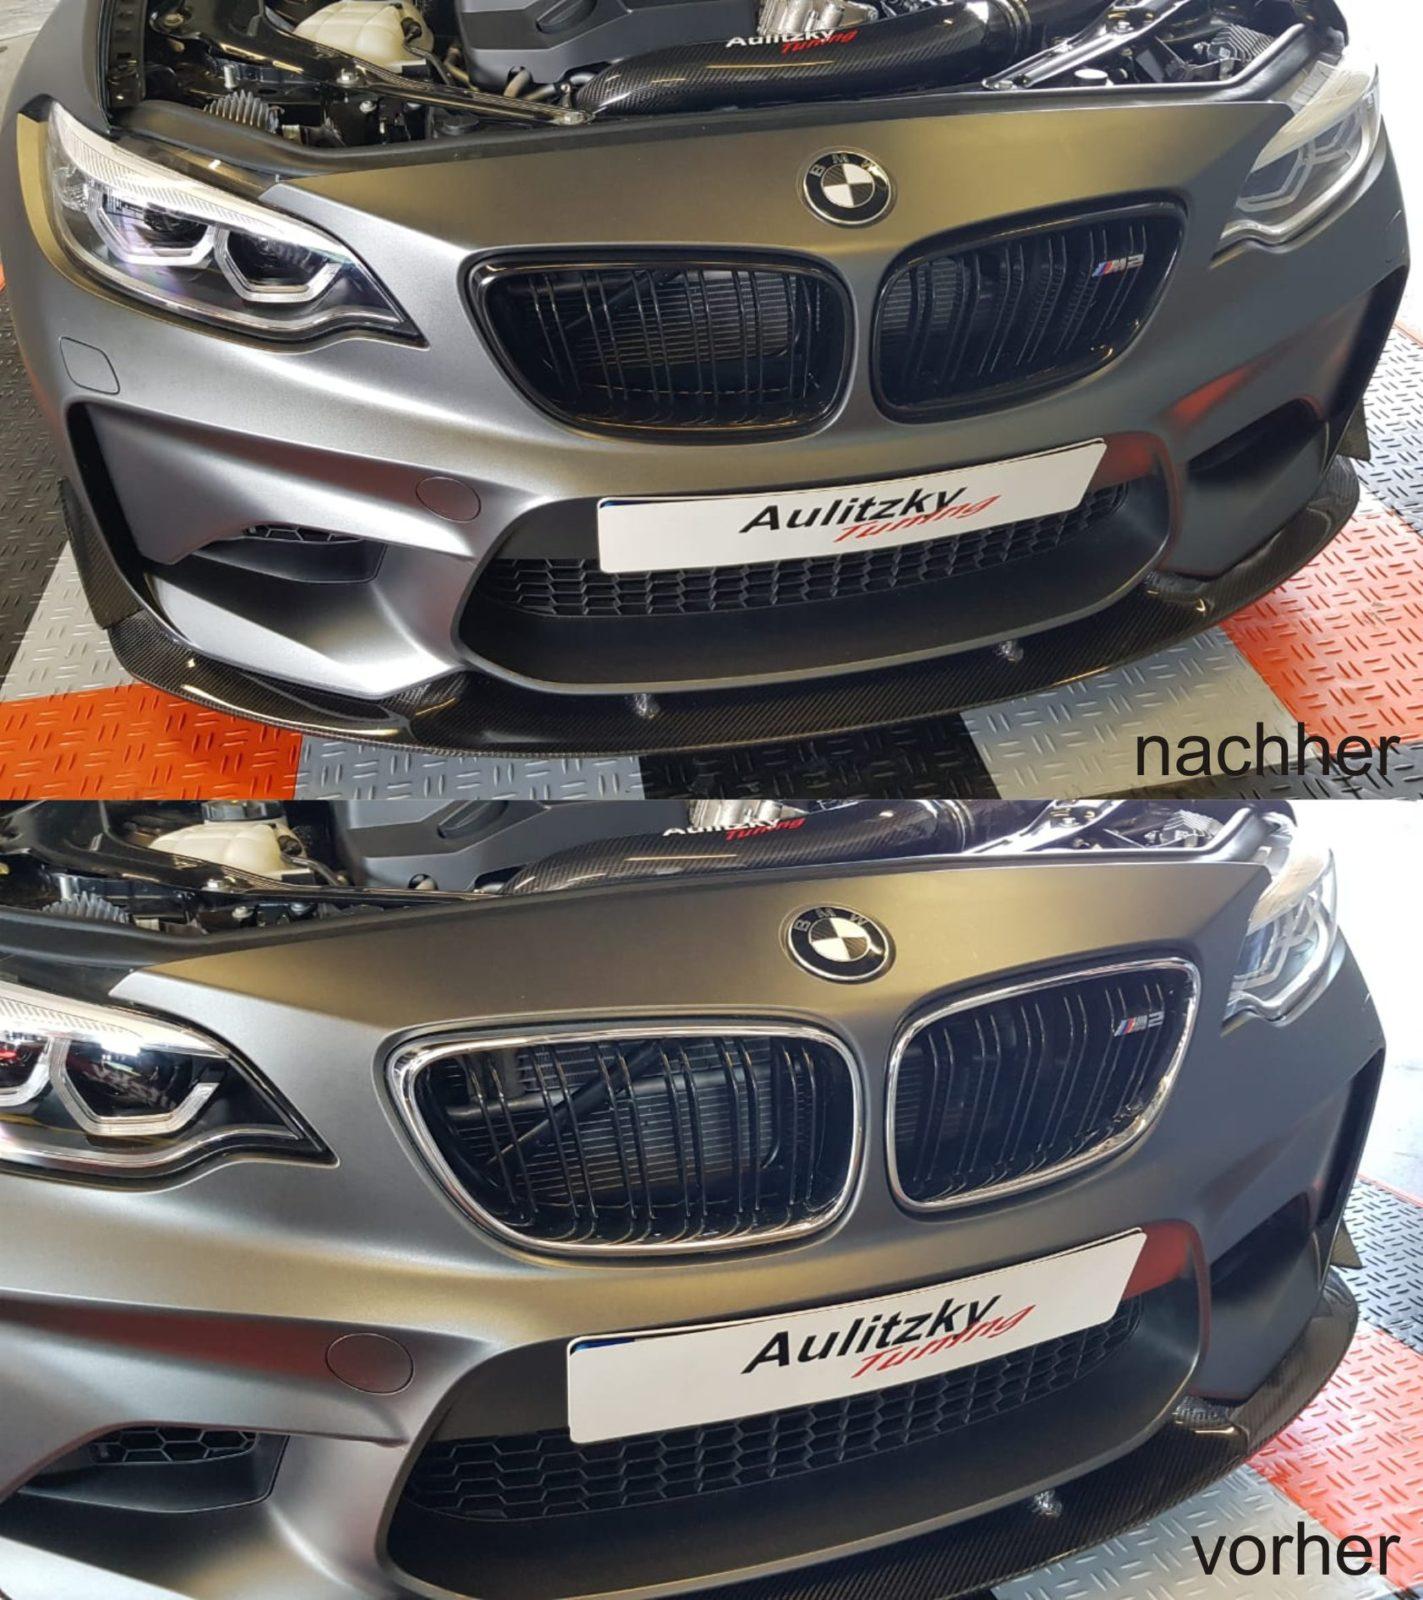 Nierenrahmen BMW